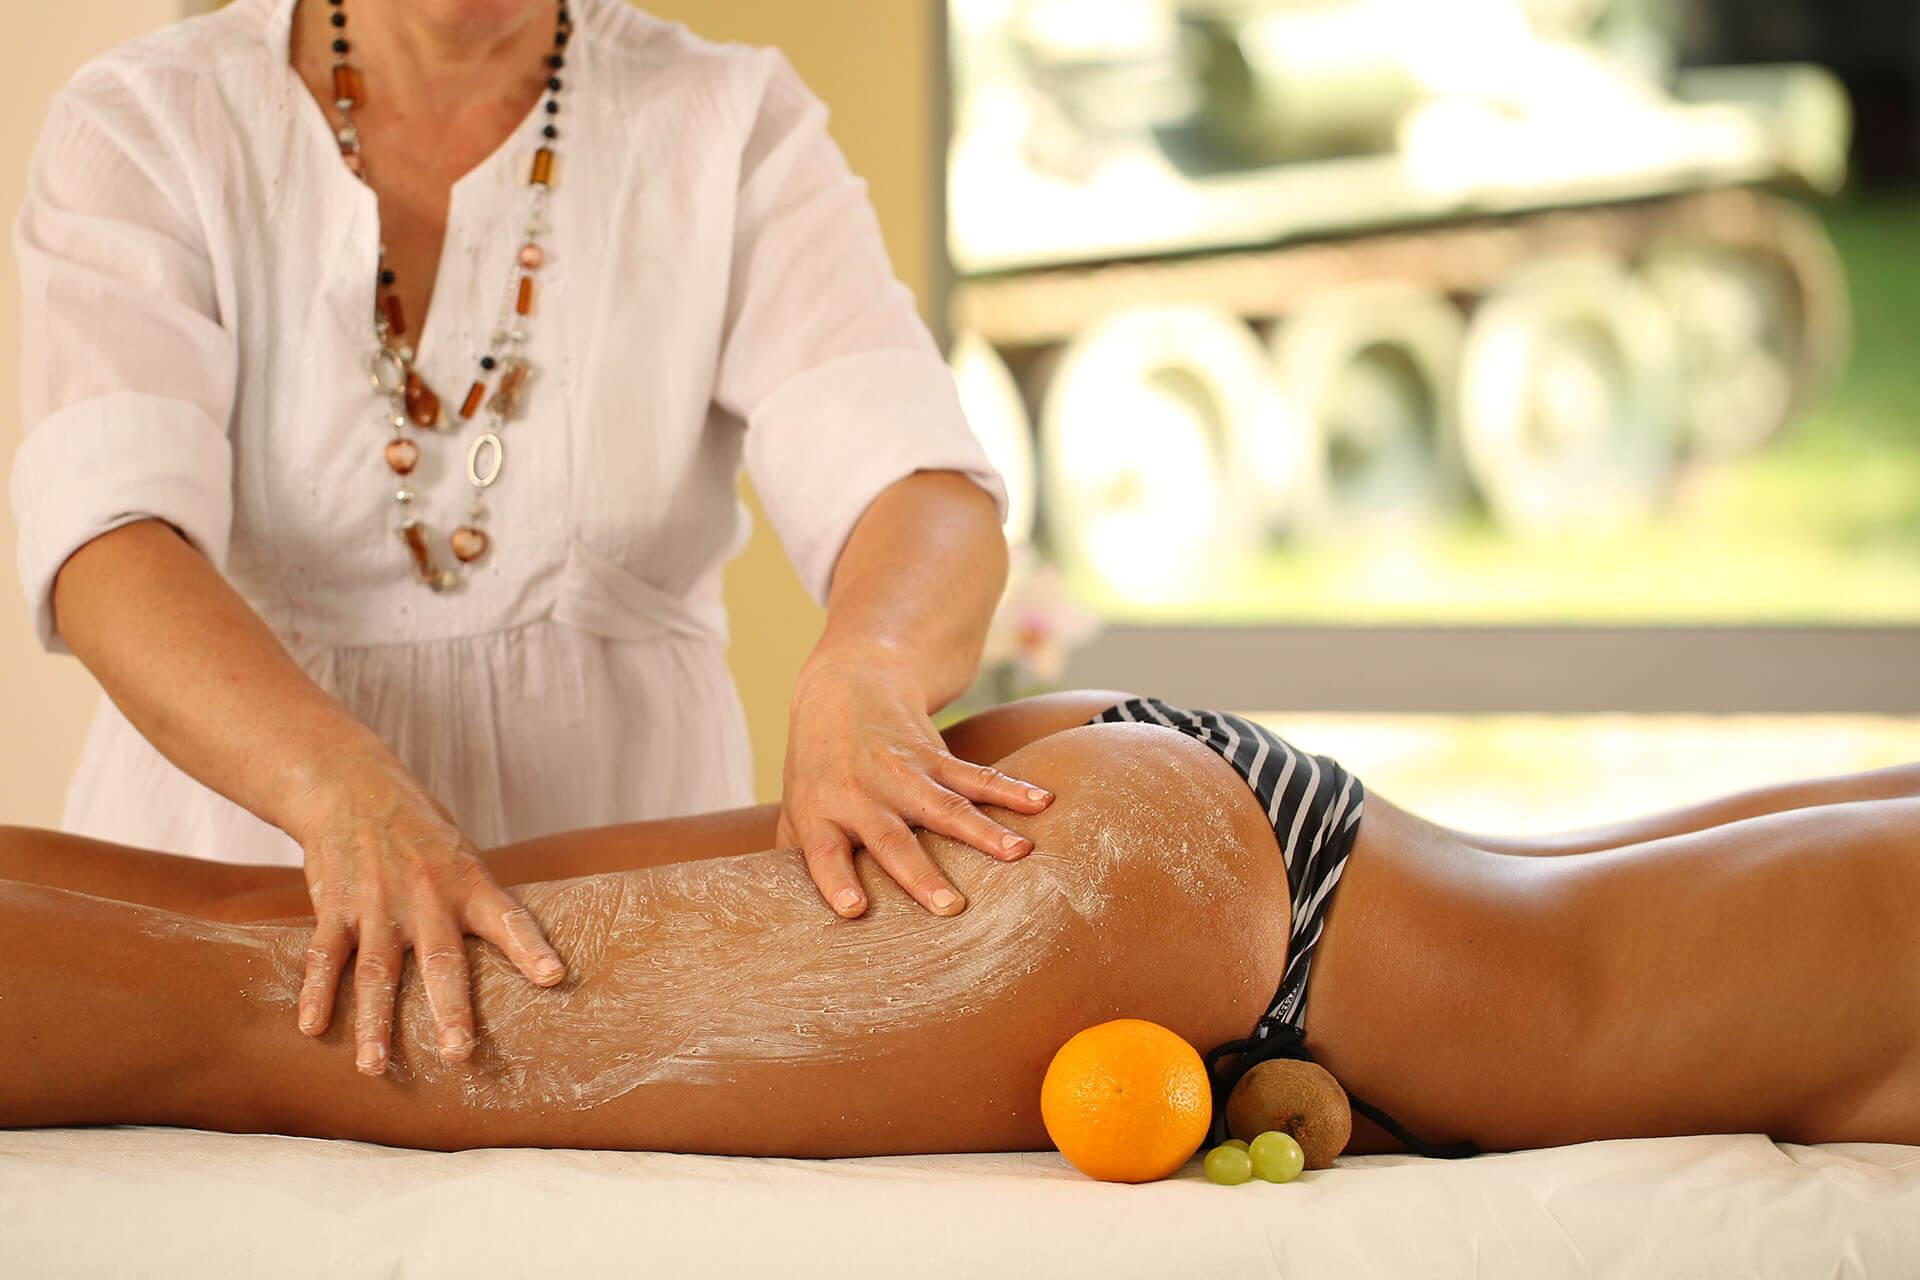 Картинка массажа антицеллюлитного массажа